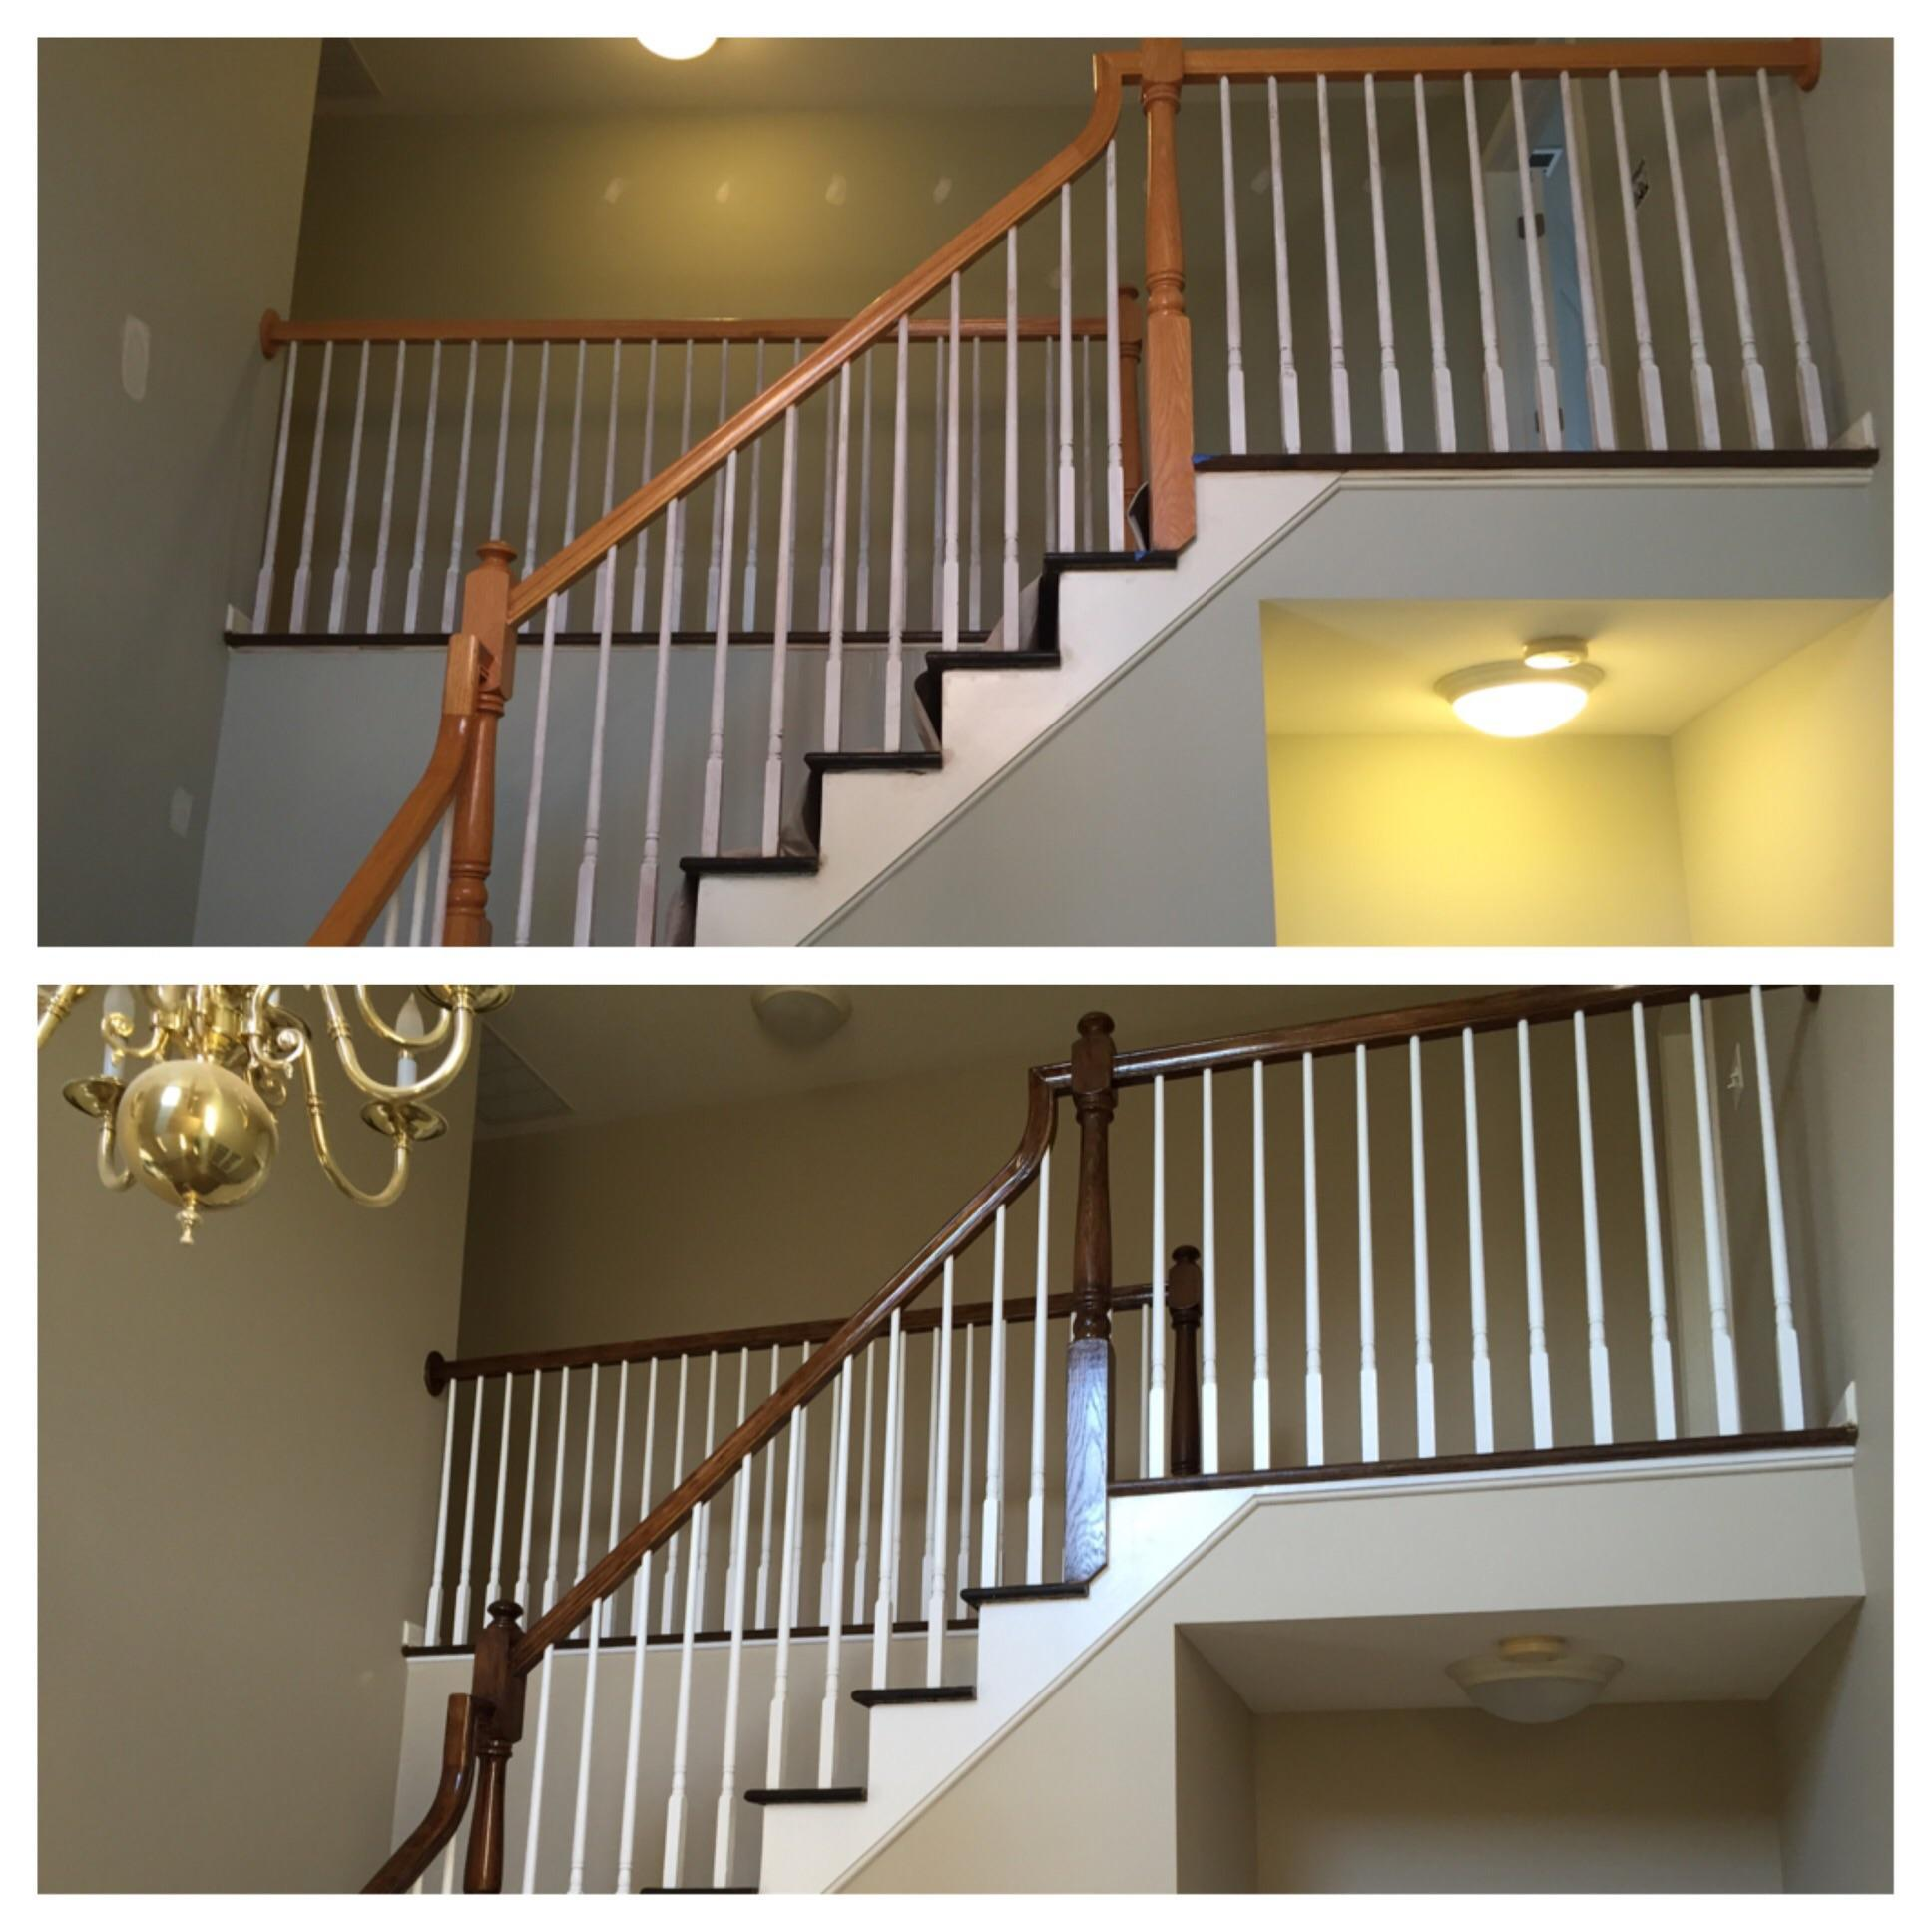 Ruamal Painting And Home Maintenance LLC image 7